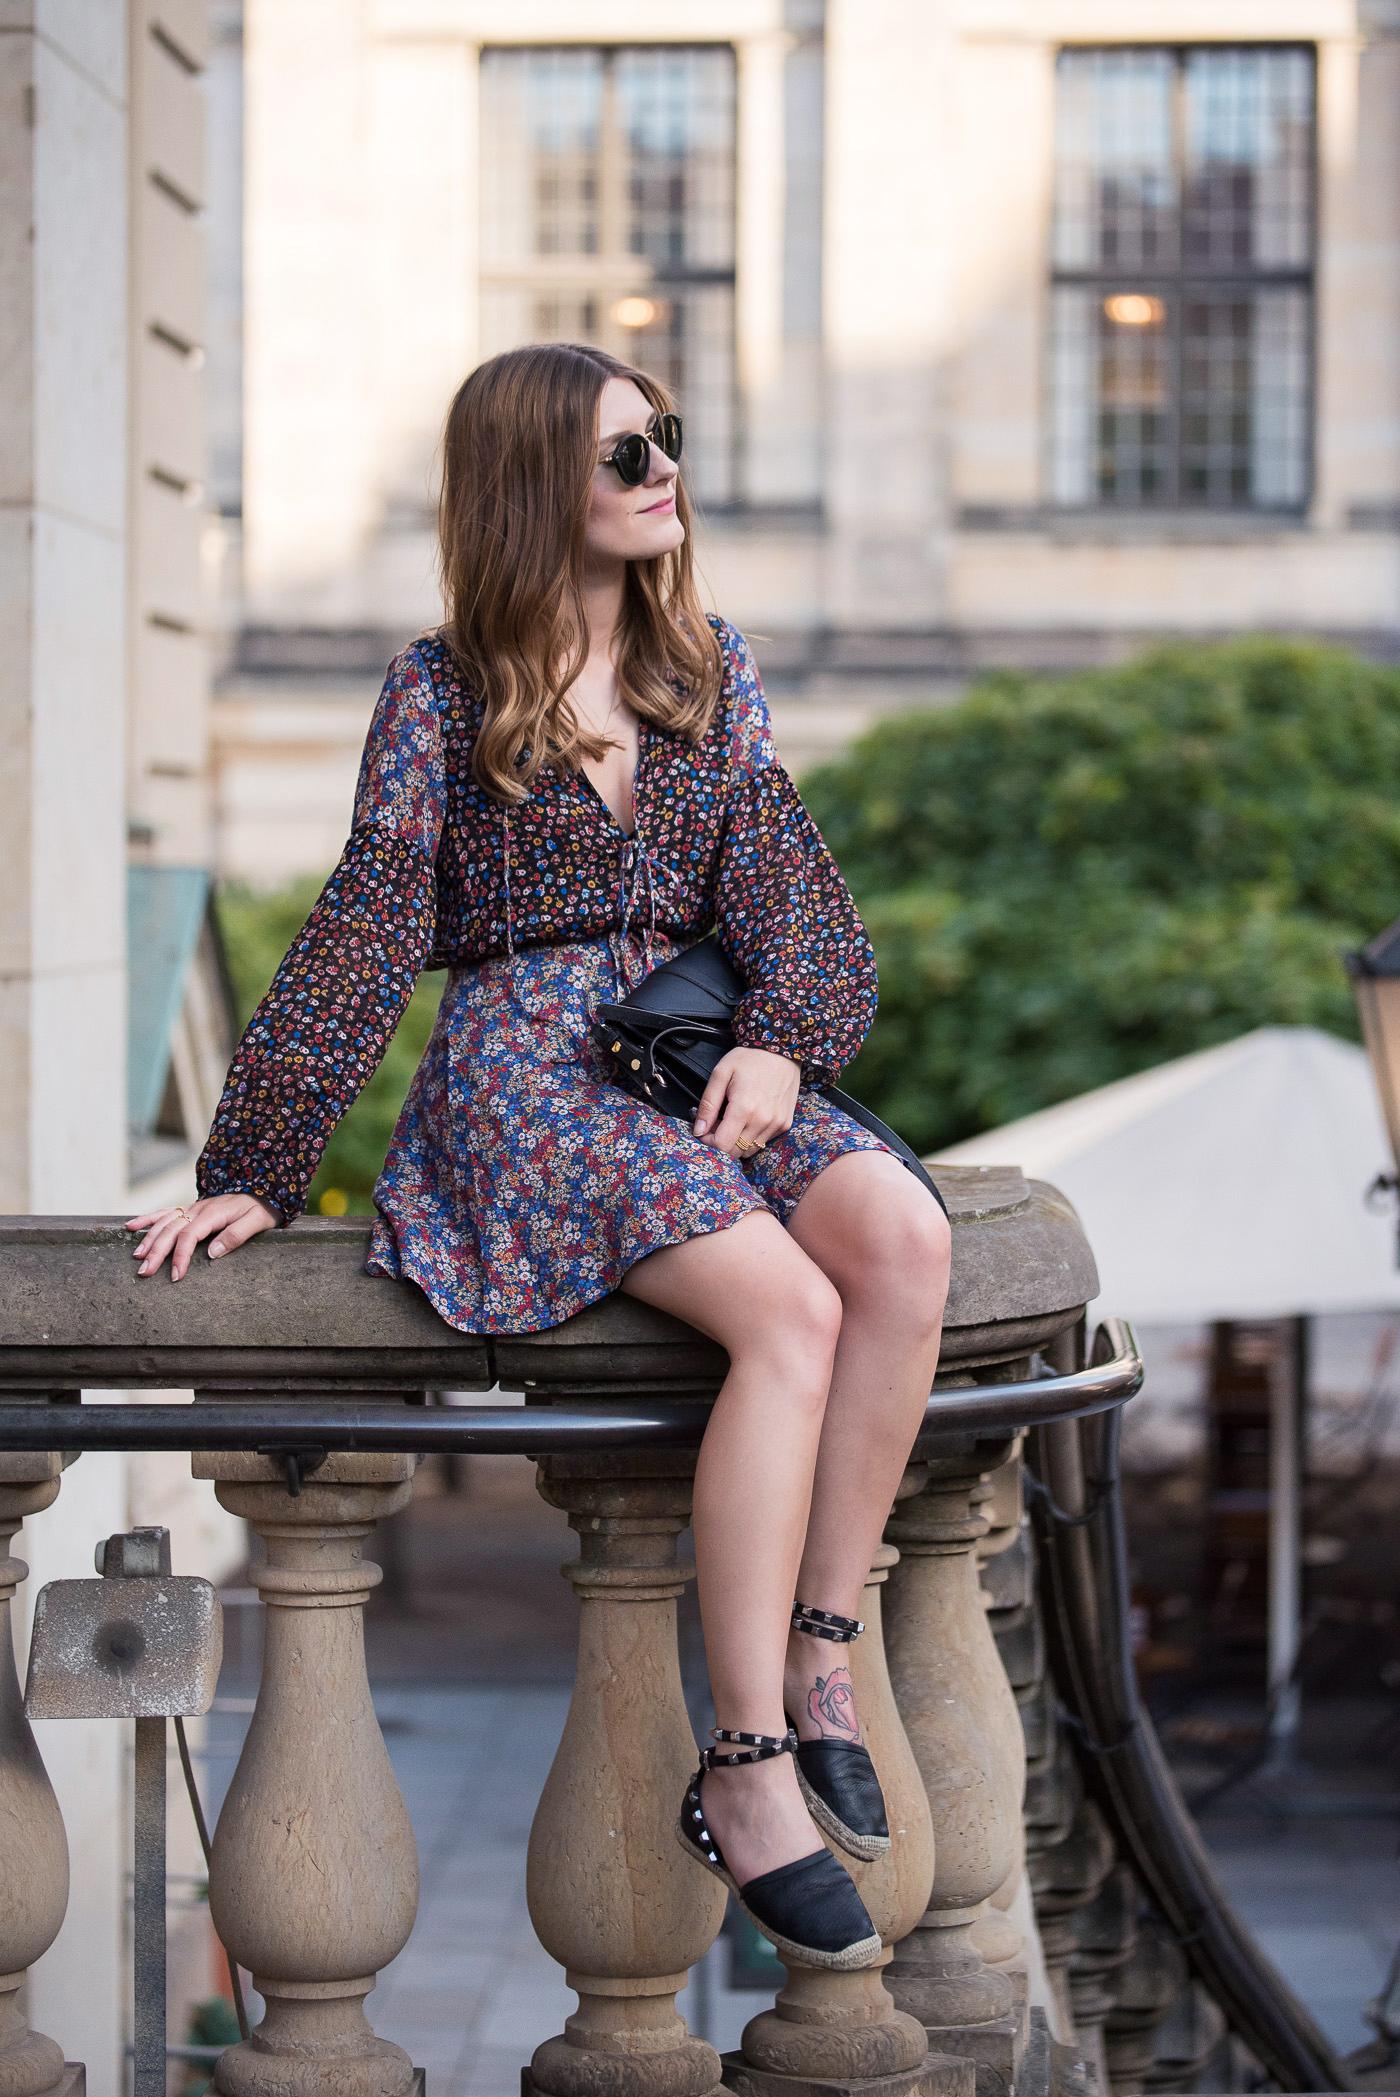 Floral_Summer_Dress_Berlin_Outfit_8